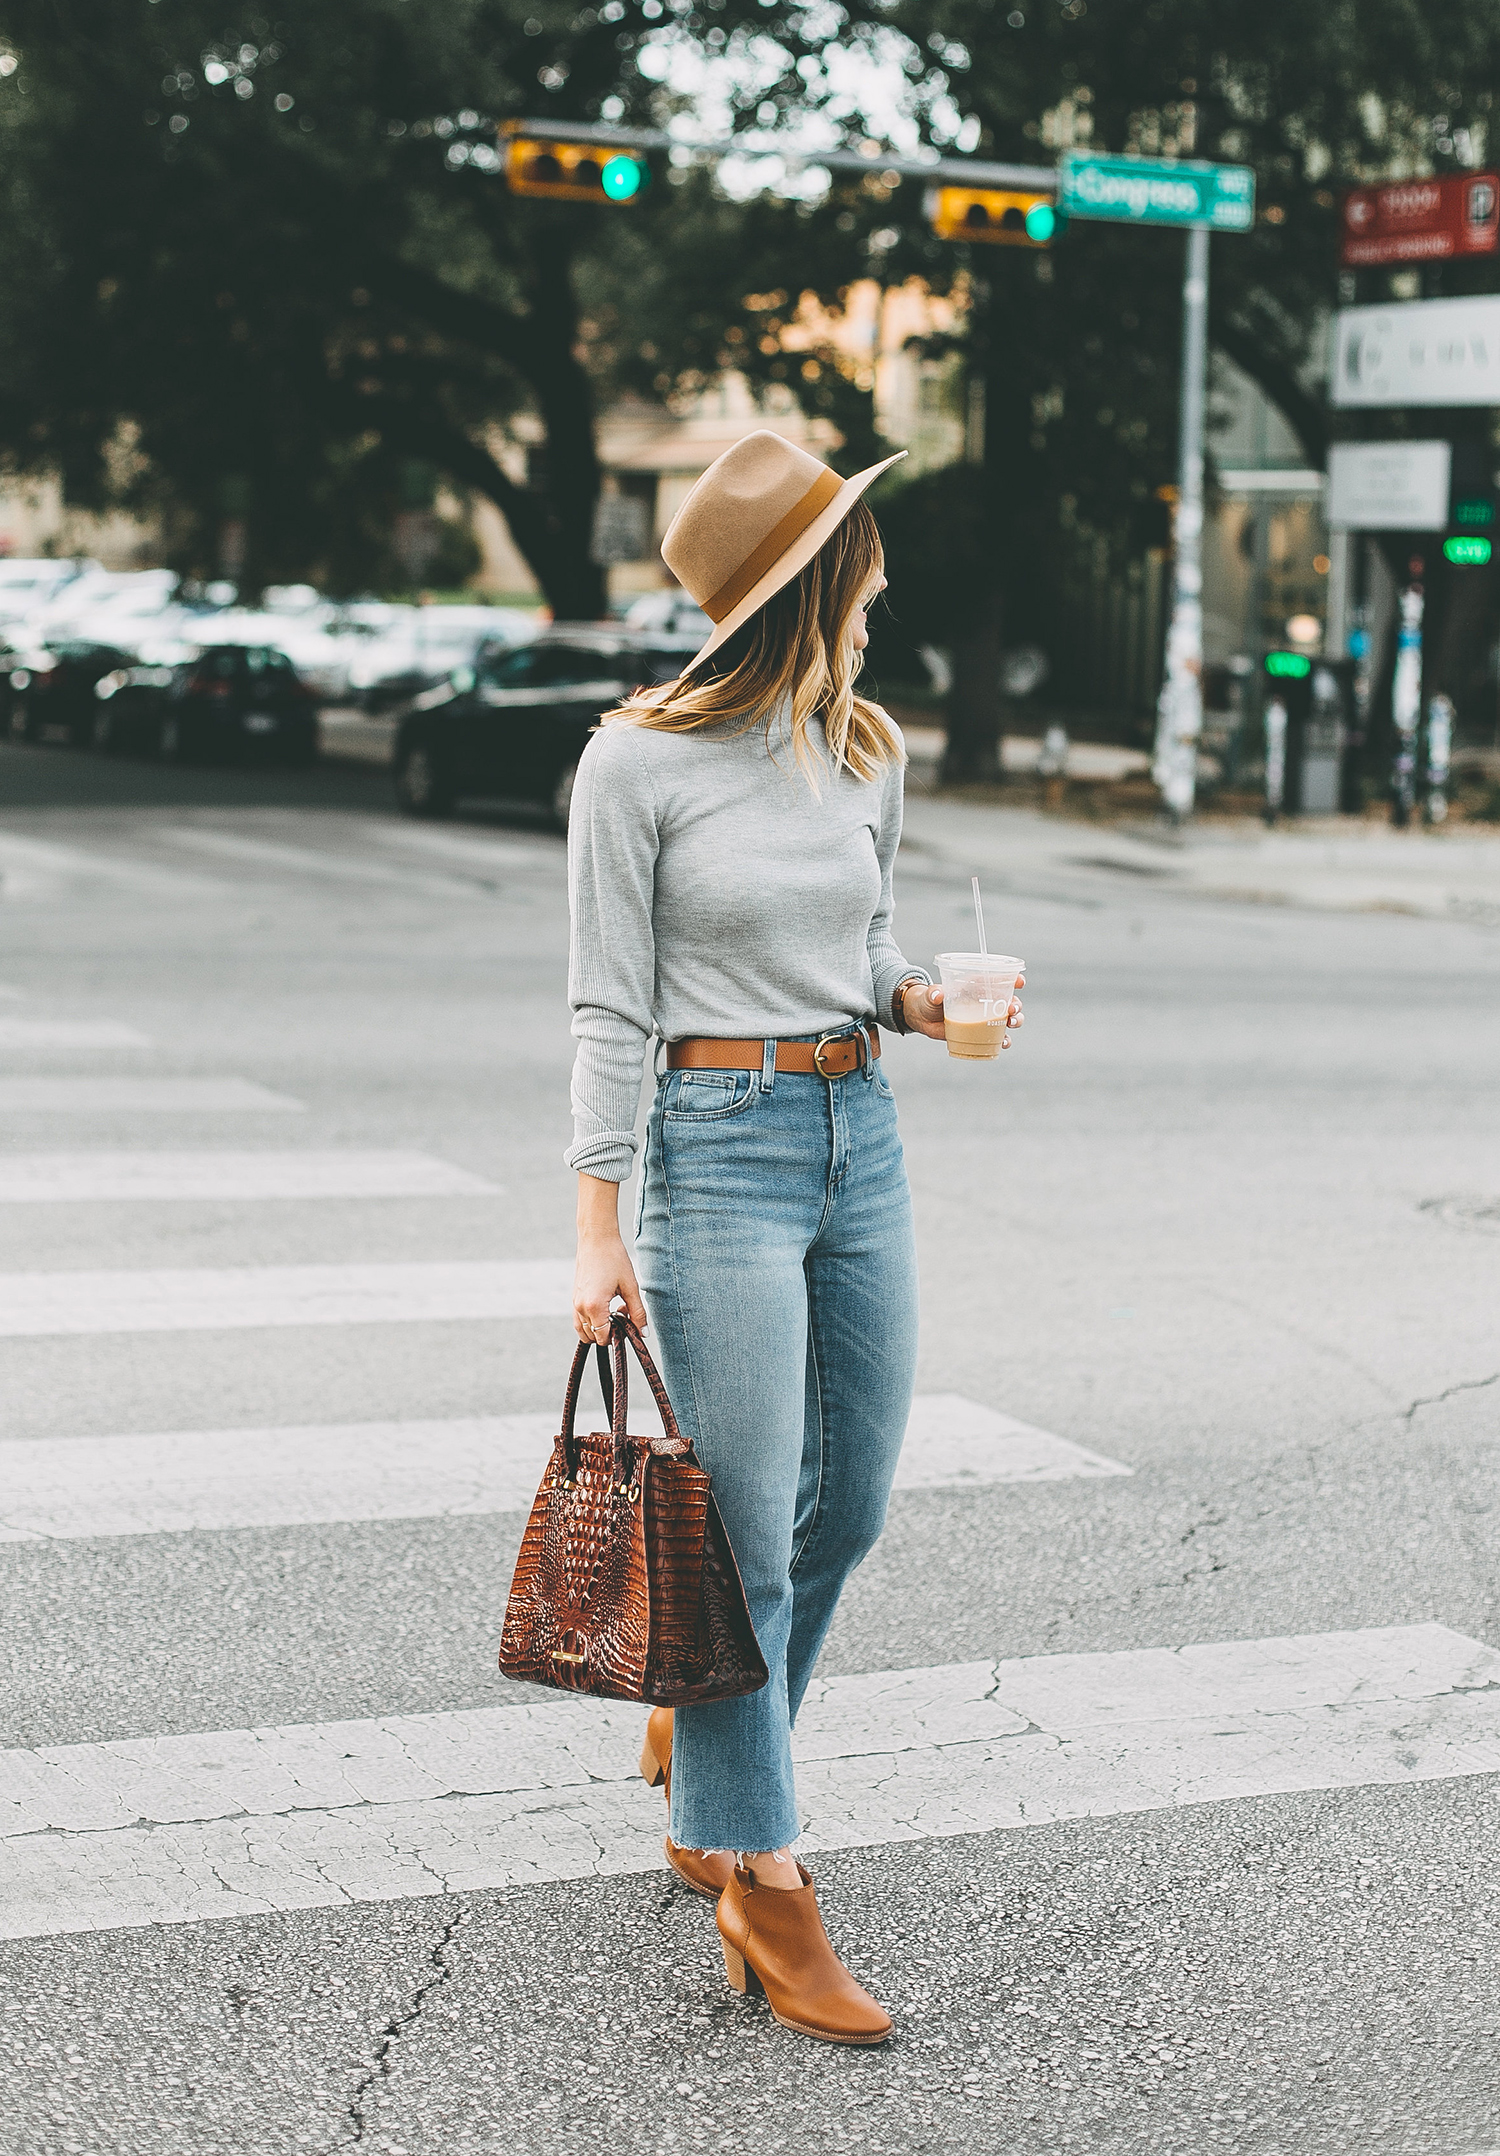 livvyland-blog-olivia-watson-south-congress-avenue-austin-texas-fashion-life-style-blogger-bdg-high-waist-crop-flare-jeans-3